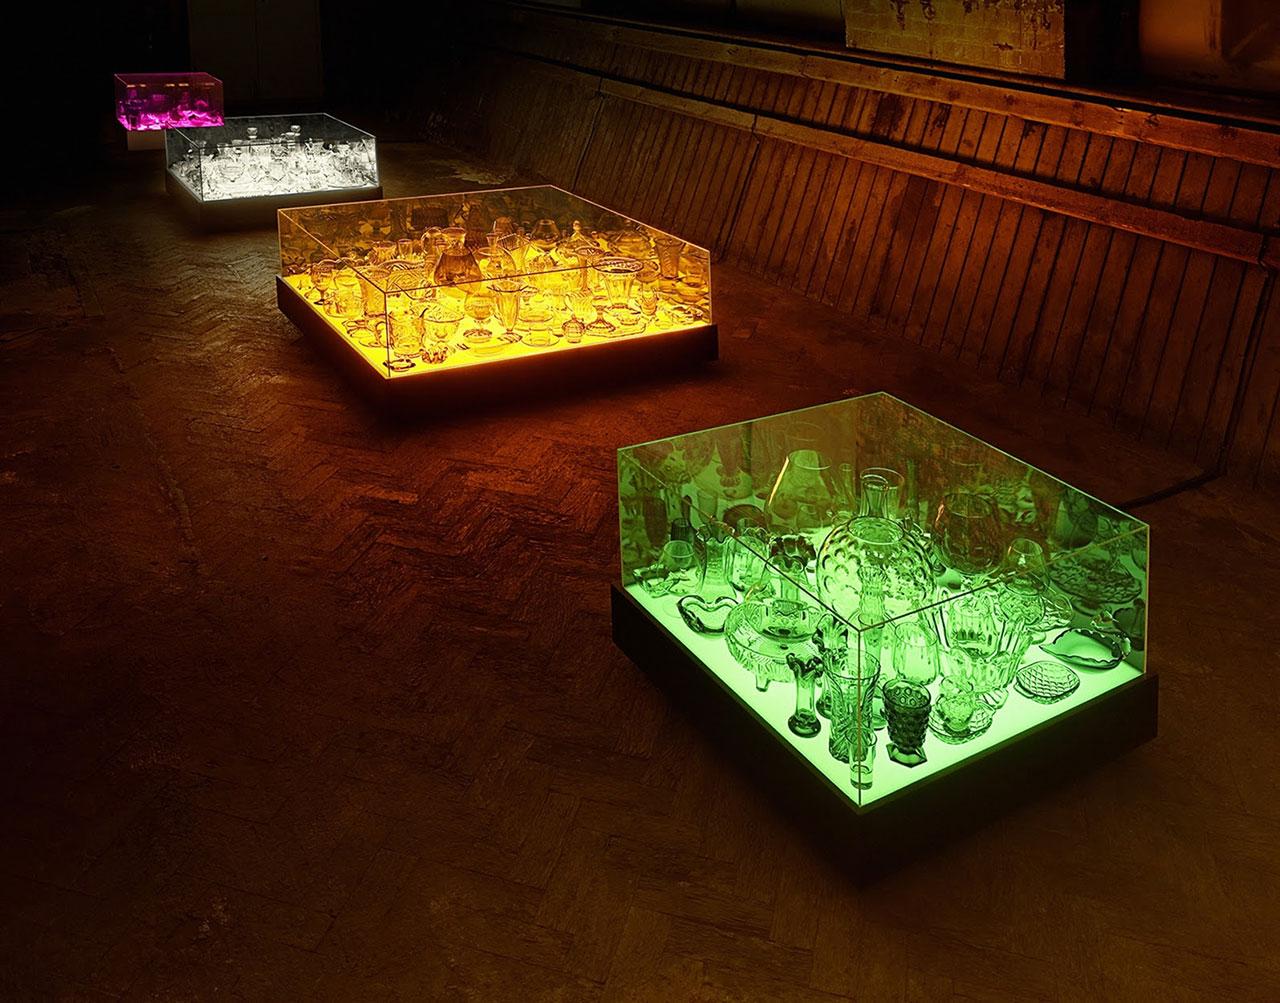 Stuart Haygarth, Aladdin (1282mm), 2006. Vintage glassware, painted MDF light box with fluorescent tubes & toughened glass vitrine. Series of 8 monochromatic vitrines. Photo courtesy Carpenters Workshop Gallery.